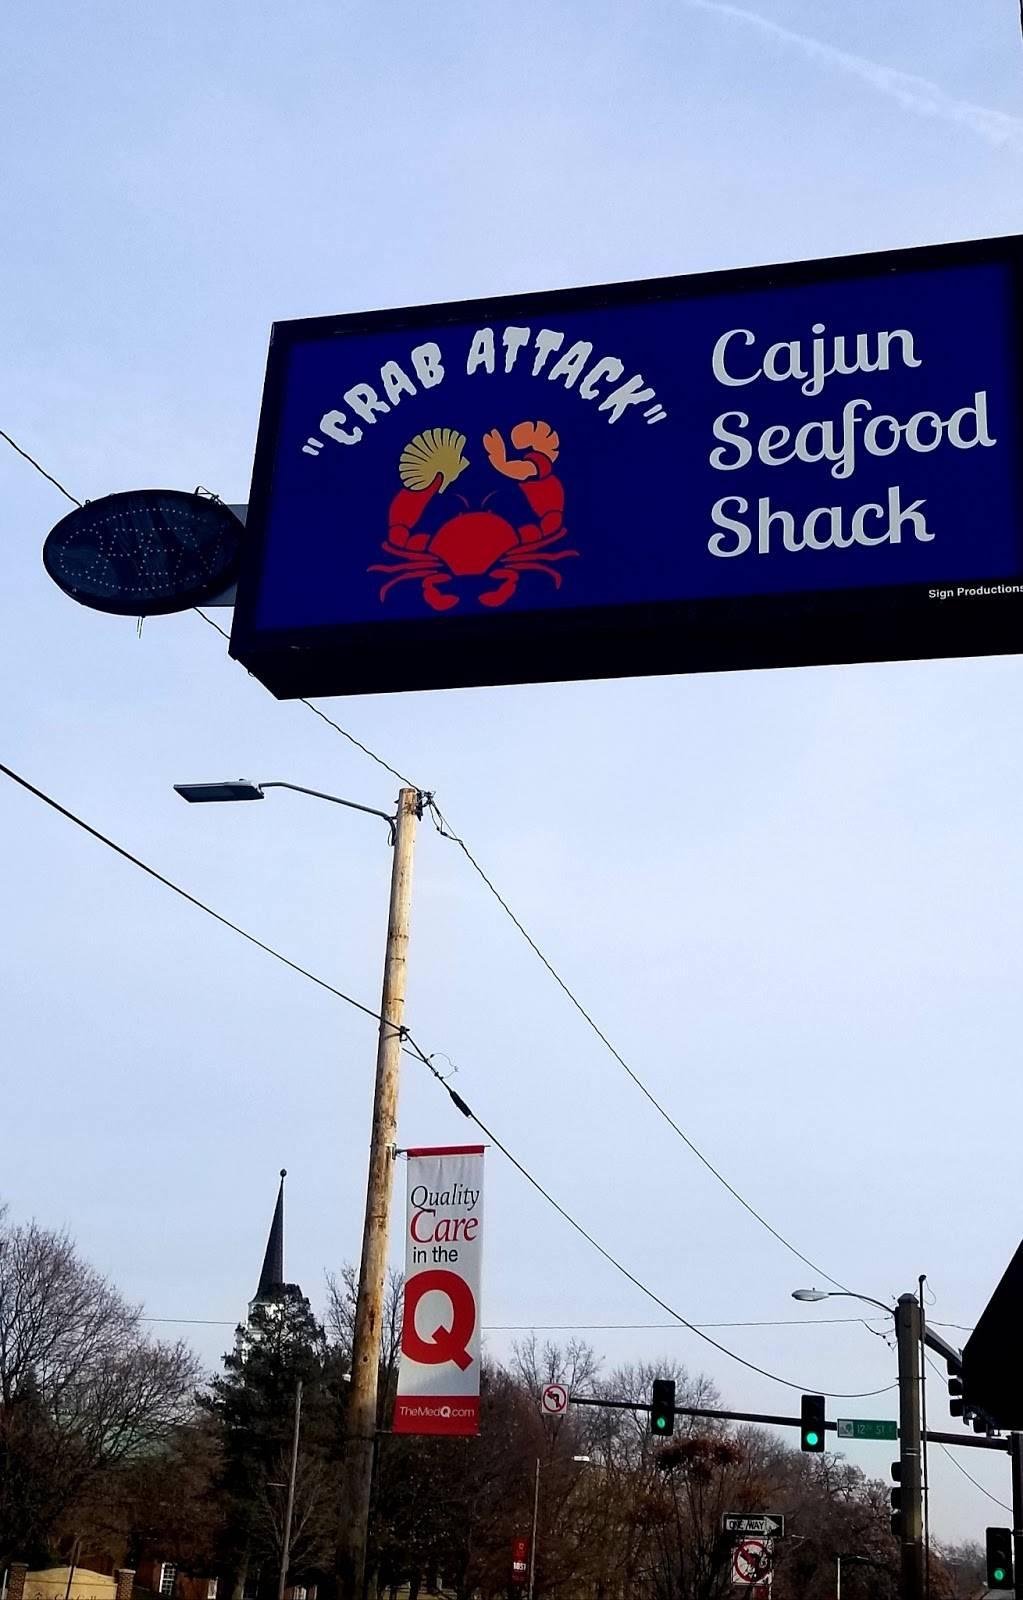 Crab Attack Cajun Seafood Shack   restaurant   1117 1st Ave SE, Cedar Rapids, IA 52402, USA   3193631175 OR +1 319-363-1175